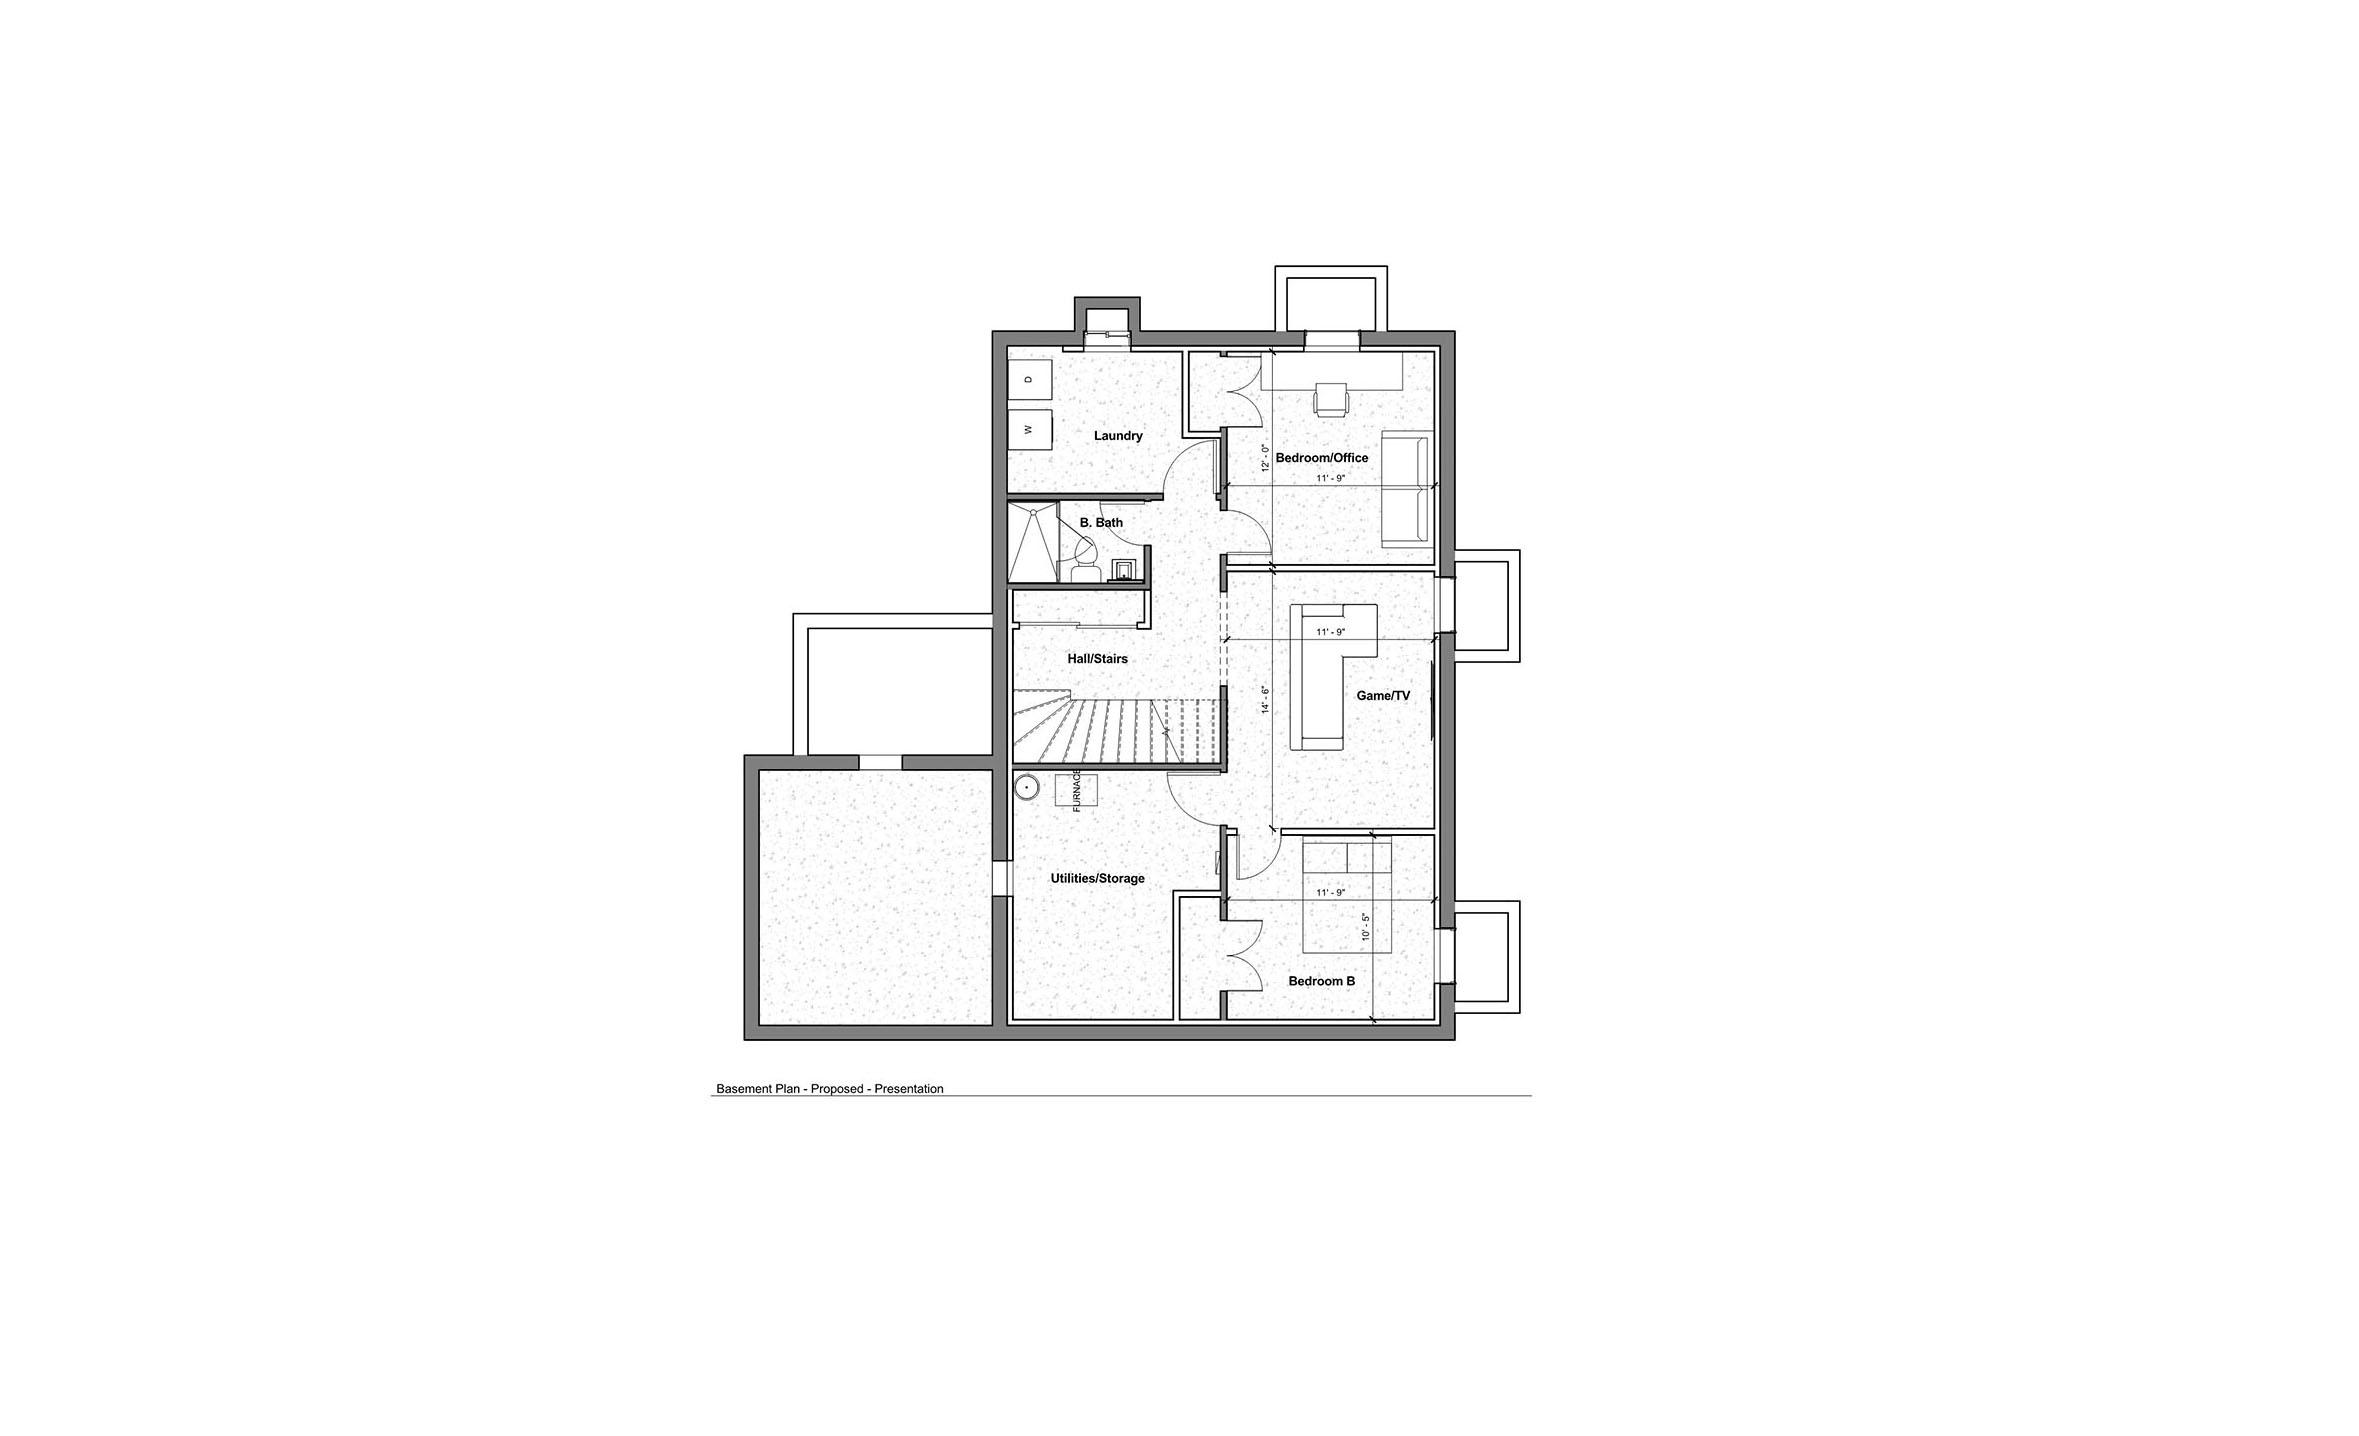 340 S Forest St - Cadence Basement Plan.jpg